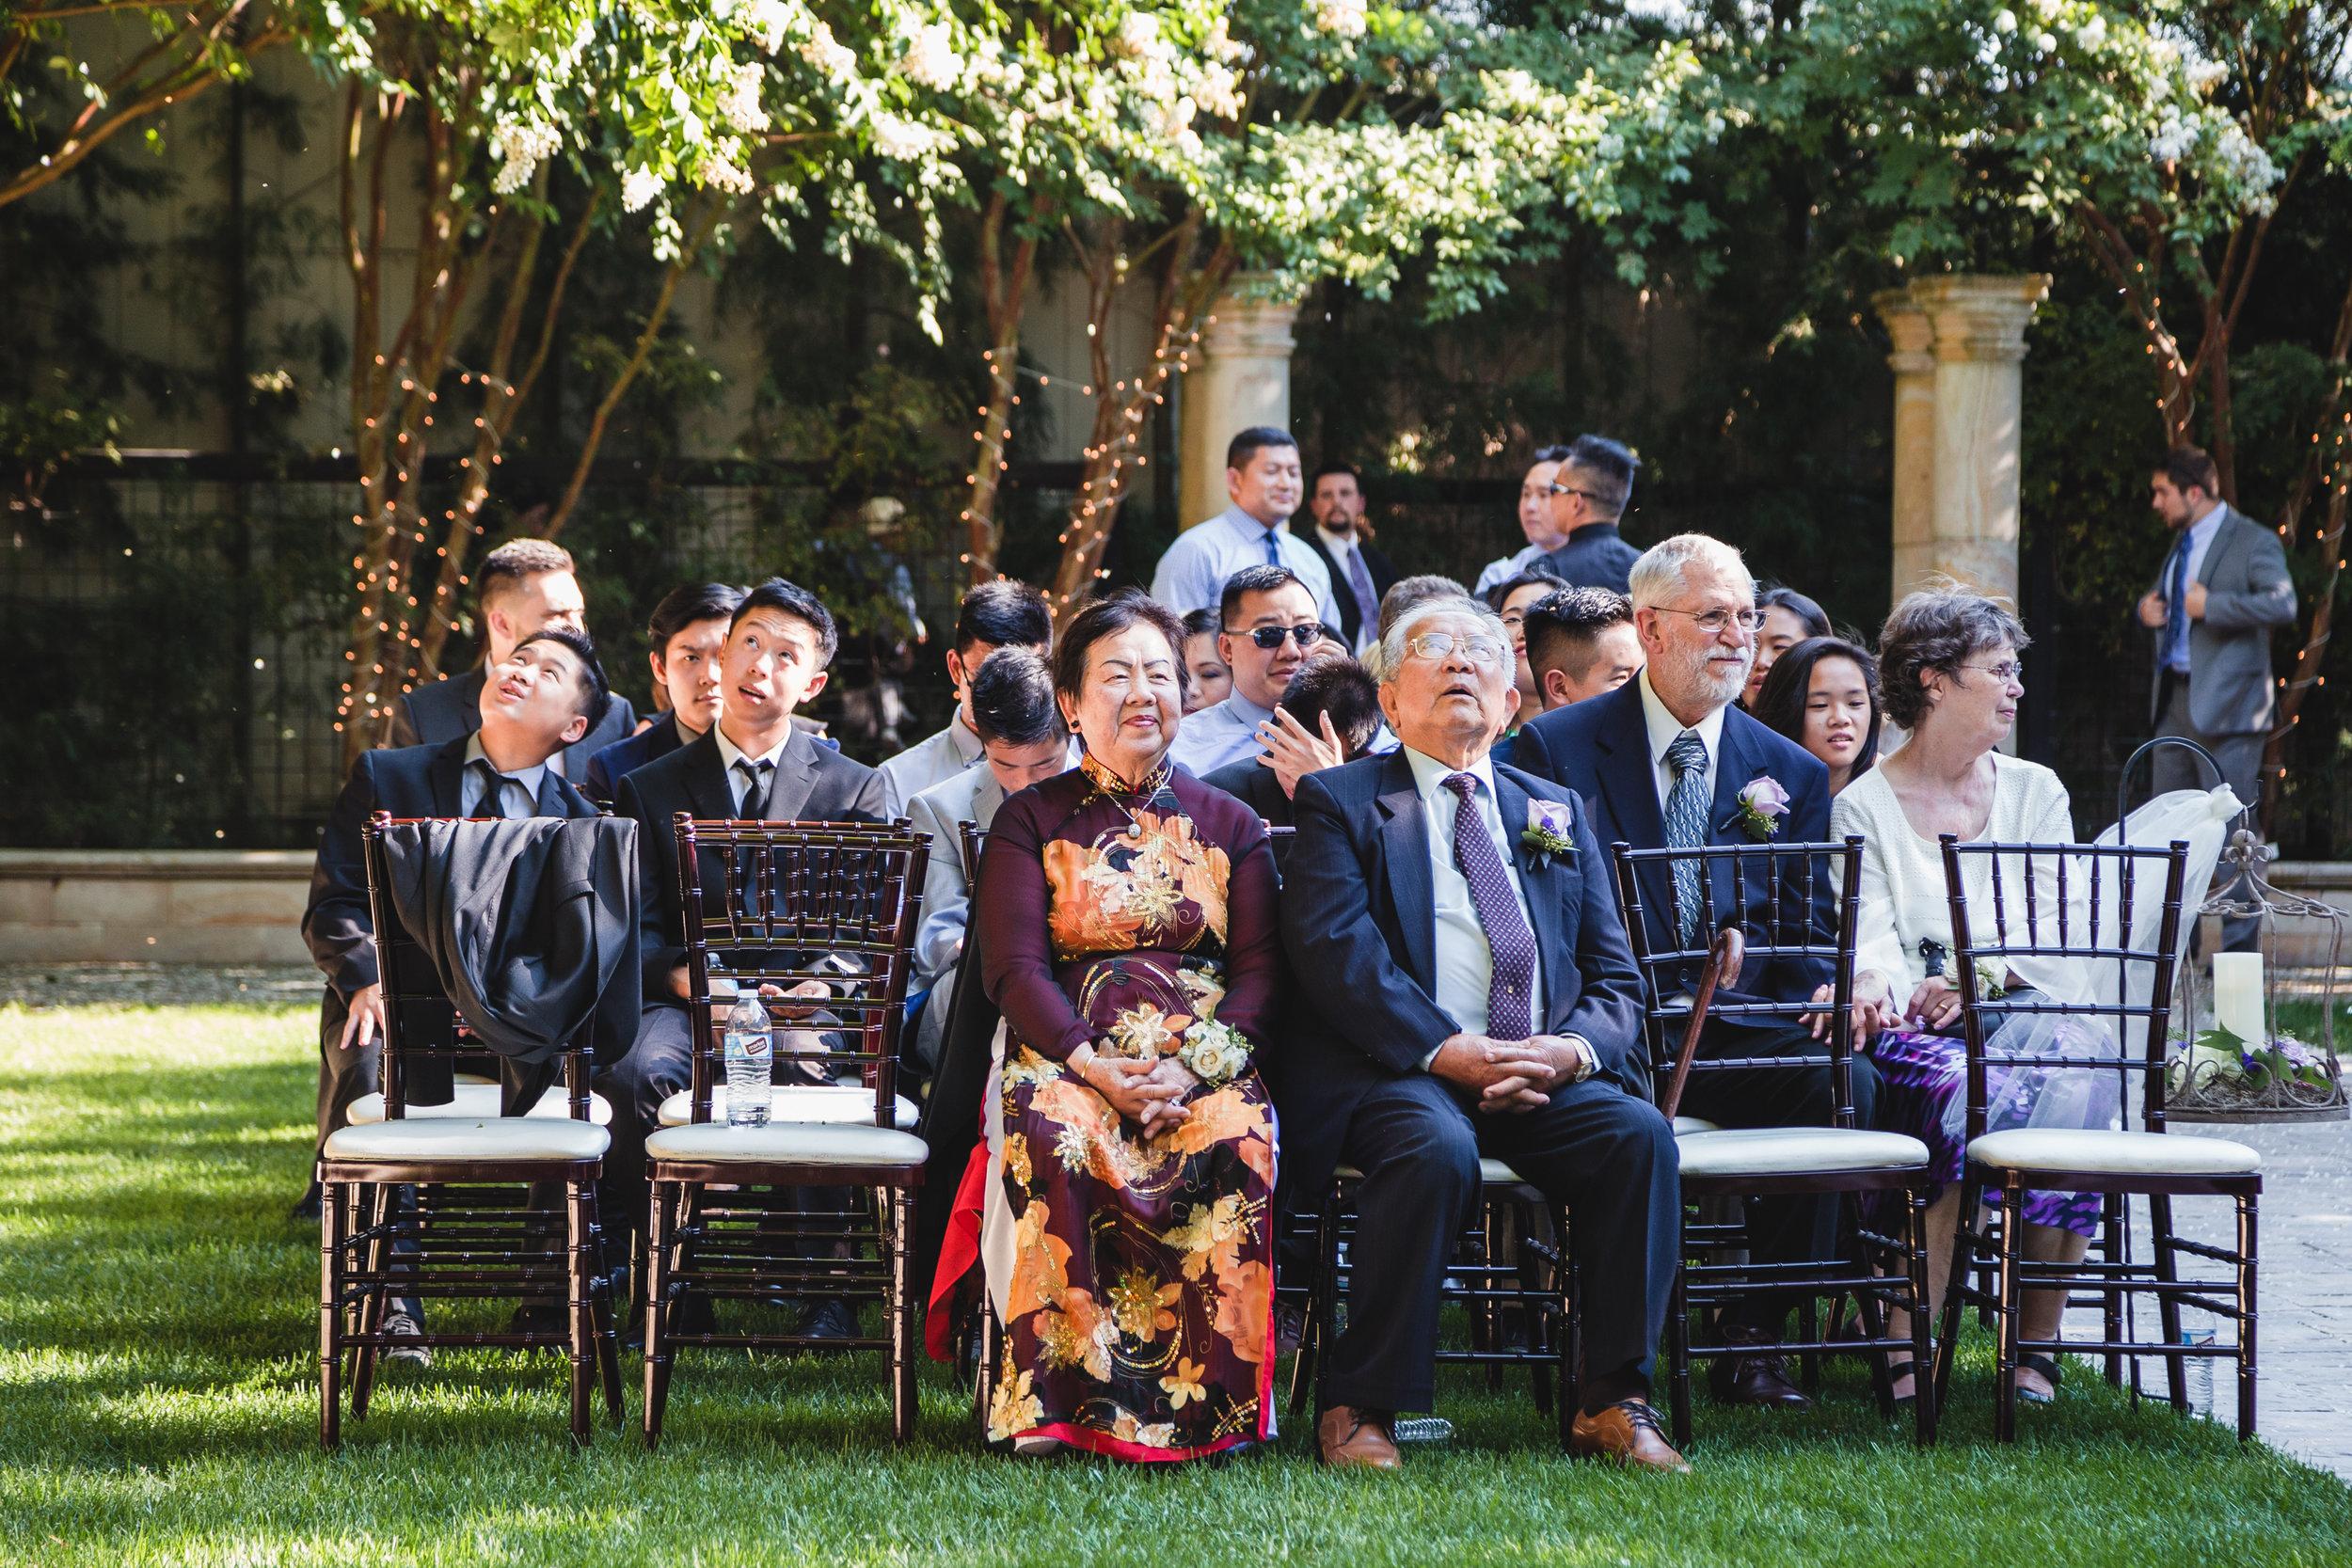 rebeccaylasotras-bay-area-garden-wedding-21.jpg